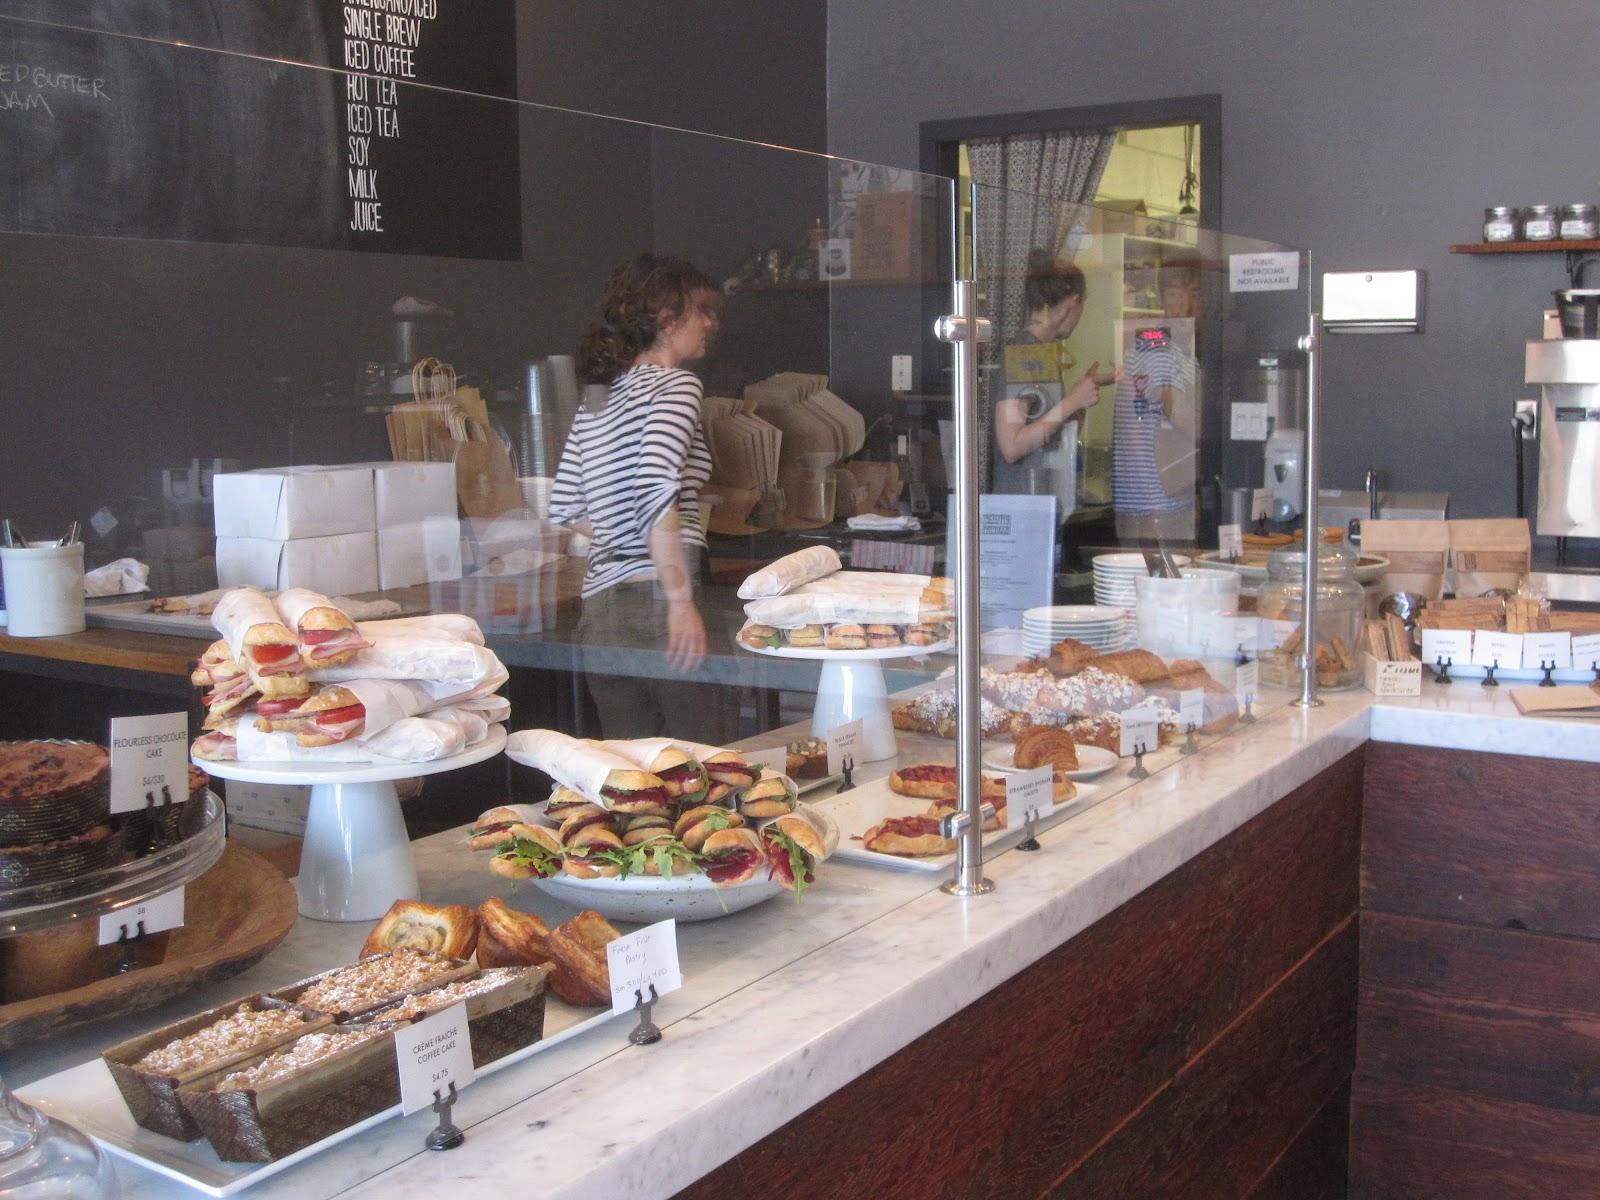 2012.06.04 proof bakery 02.JPG